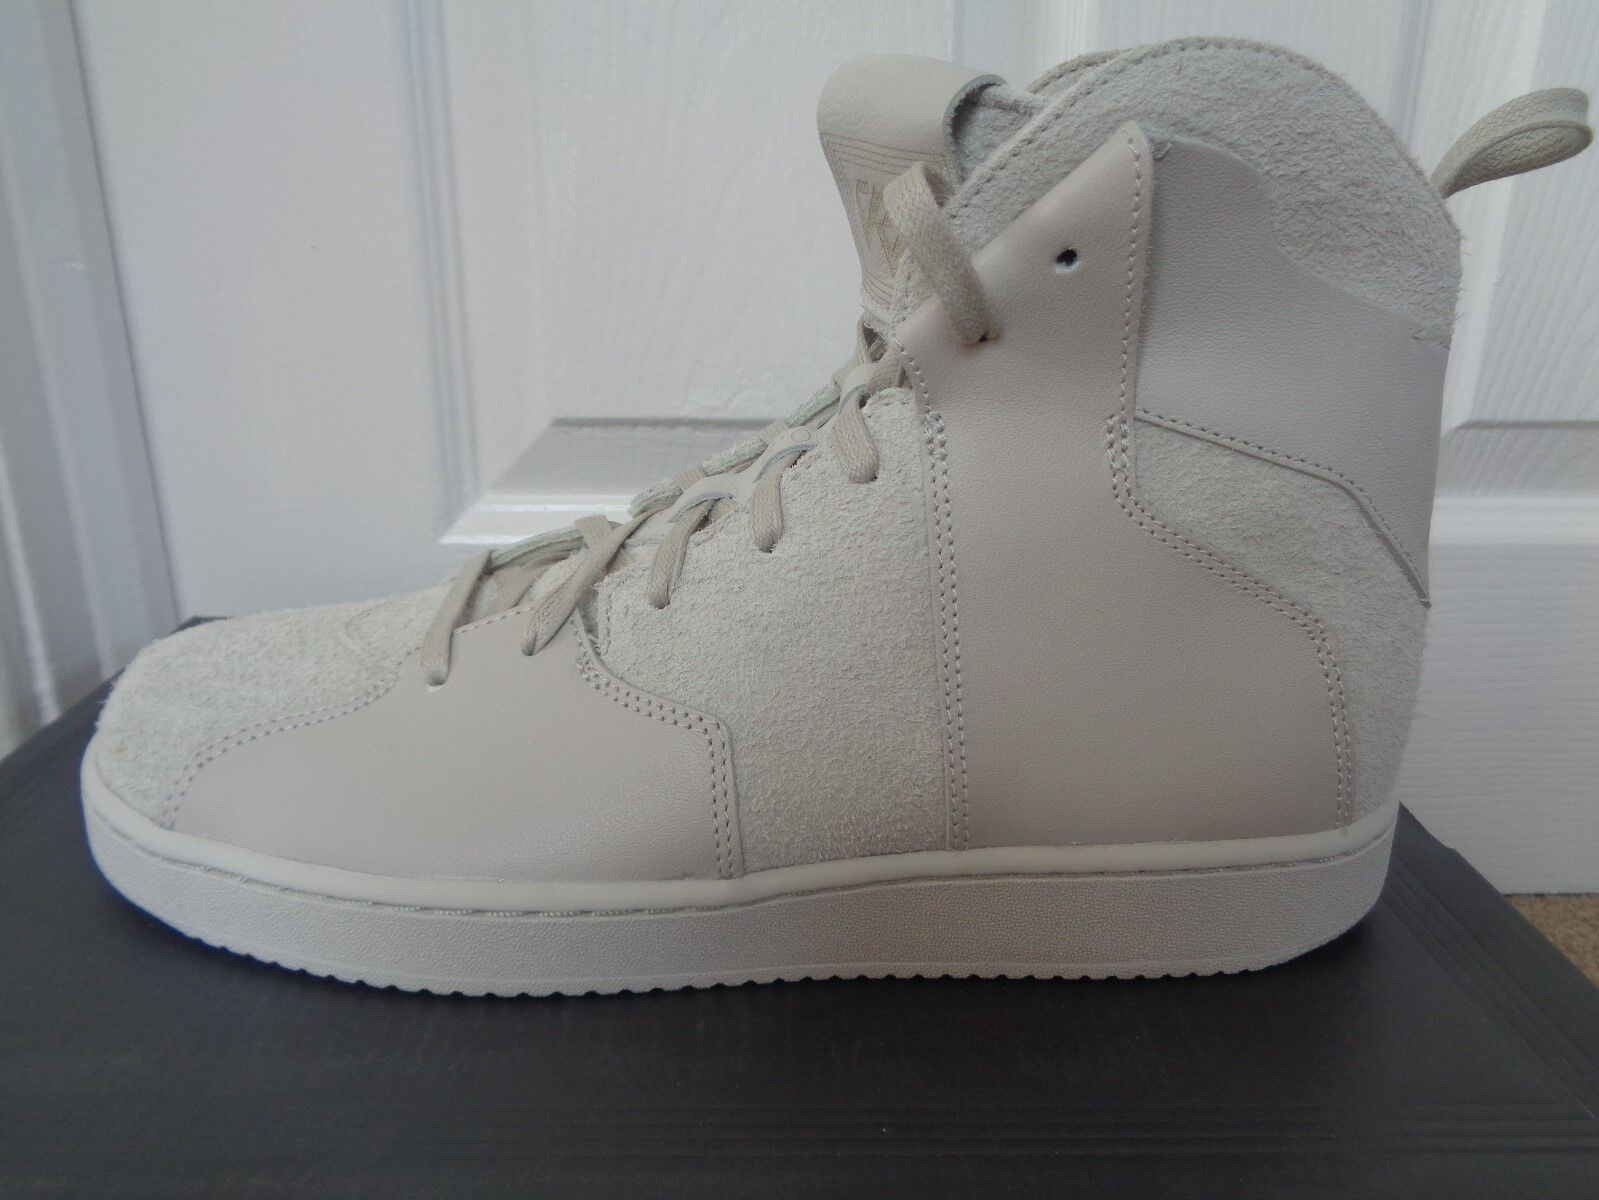 Nike Jordan Westbrook 0.2 trainers shoes 854563 002 eu 45 us 11 NEW+BOX